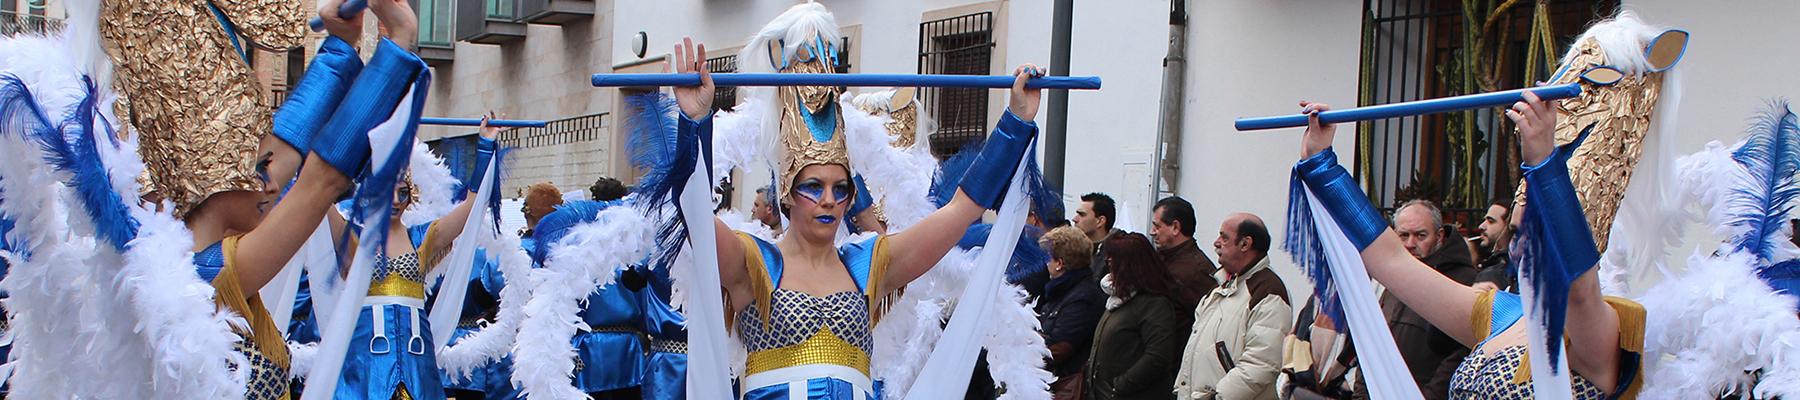 carnaval-miguelturra-domingo-pinata-desfile